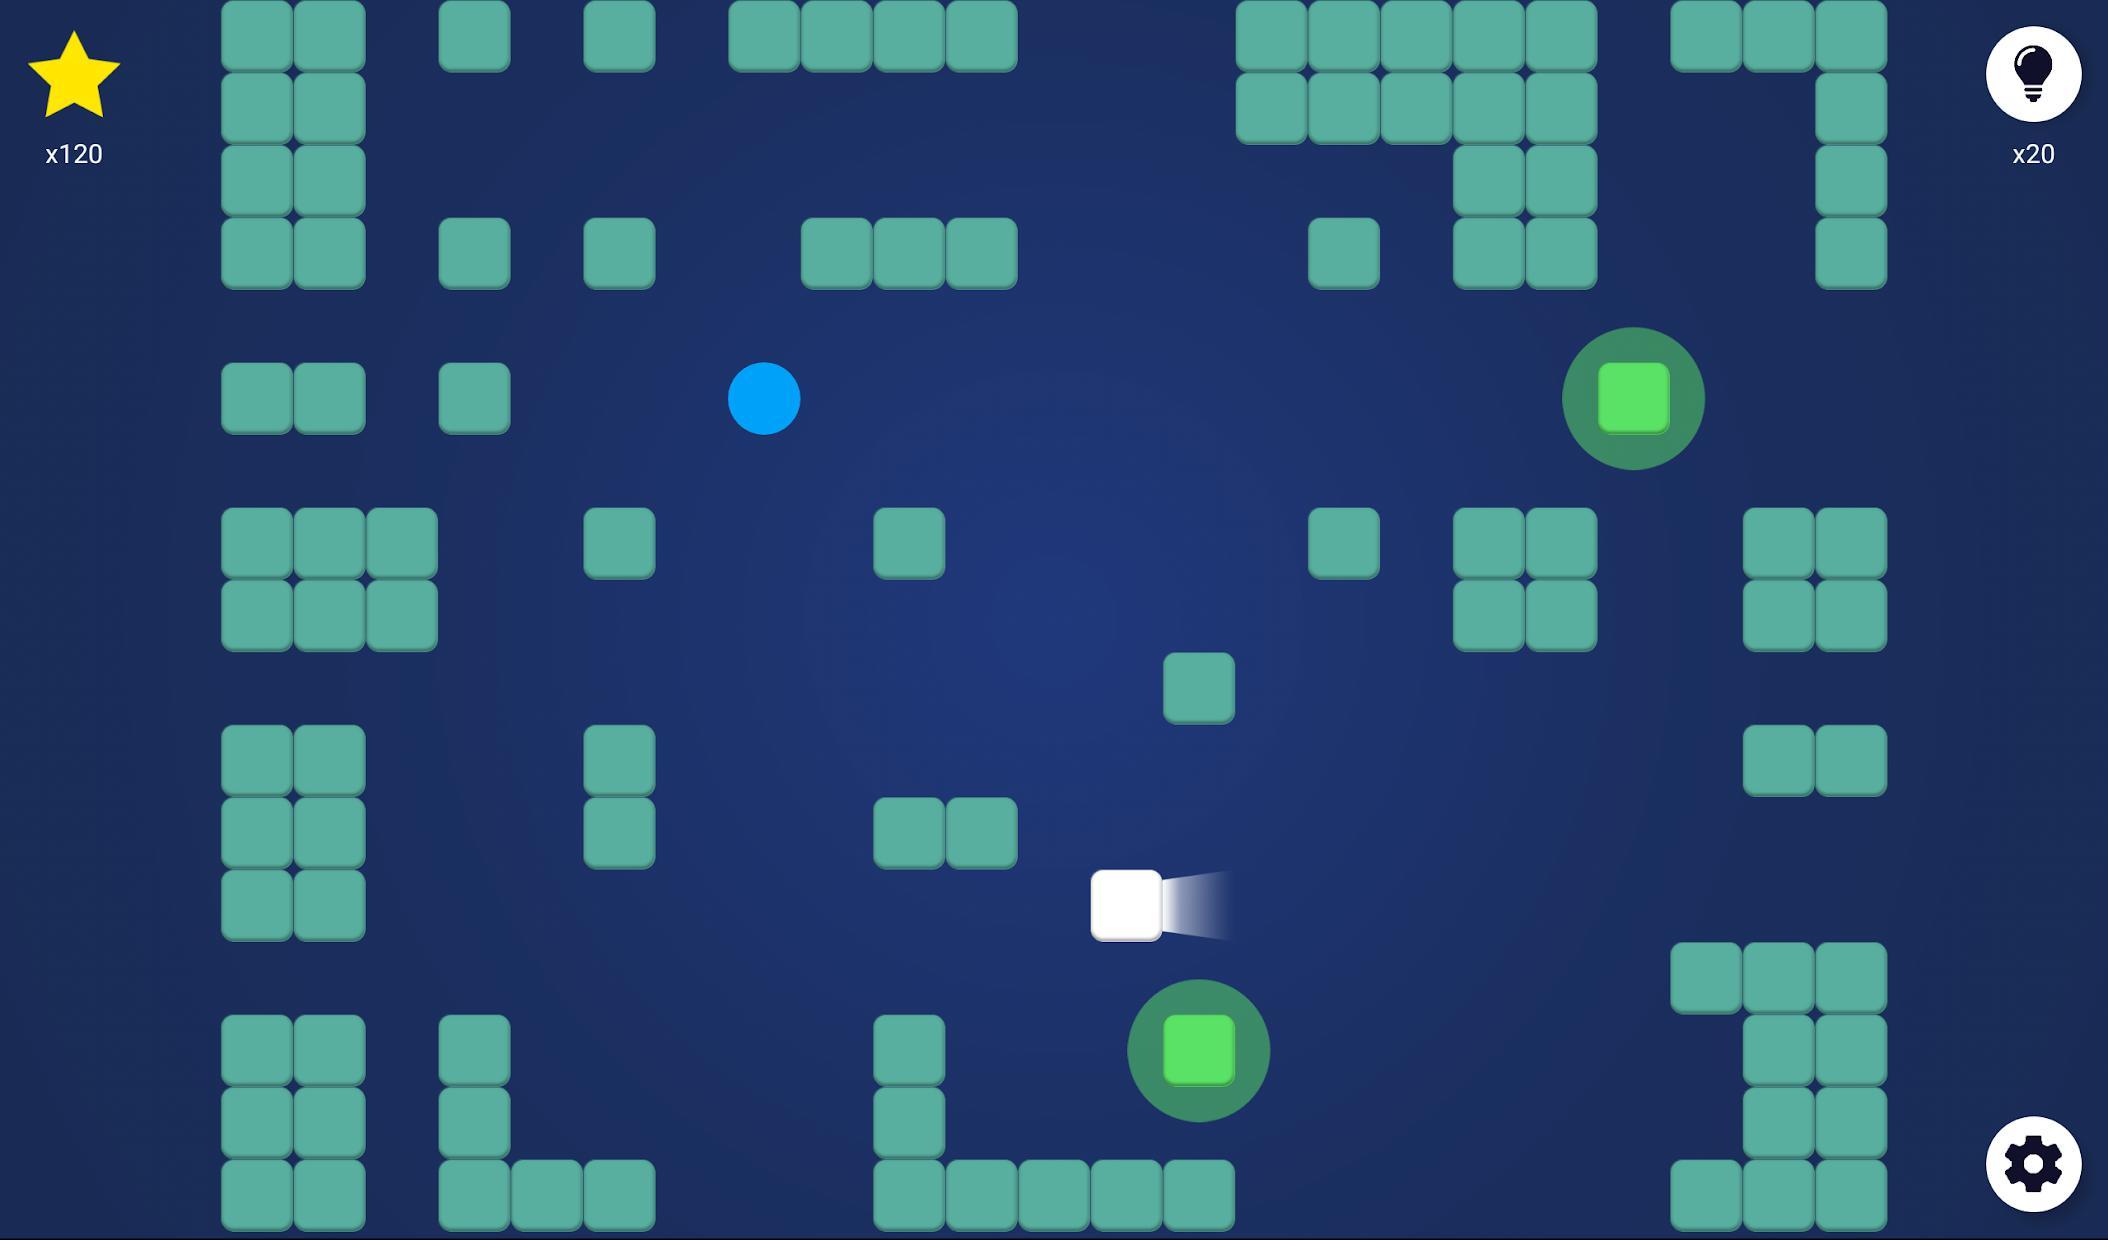 Mindblox - Impossible Slide Puzzle 游戏截图5